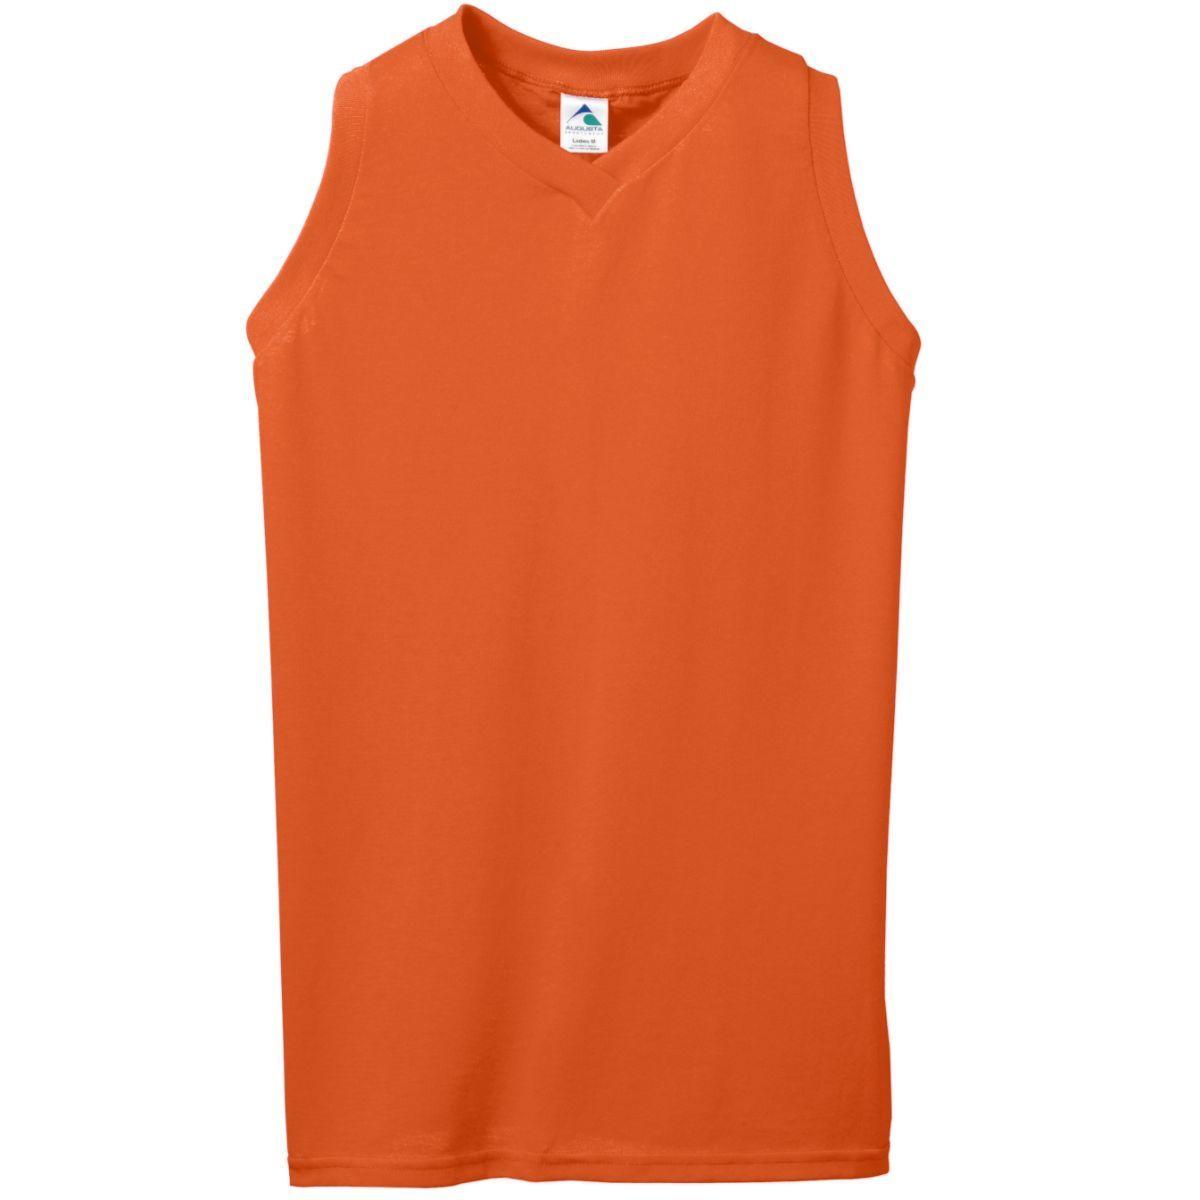 Ladies Sleeveless V-Neck Poly/Cotton Jersey - ORANGE